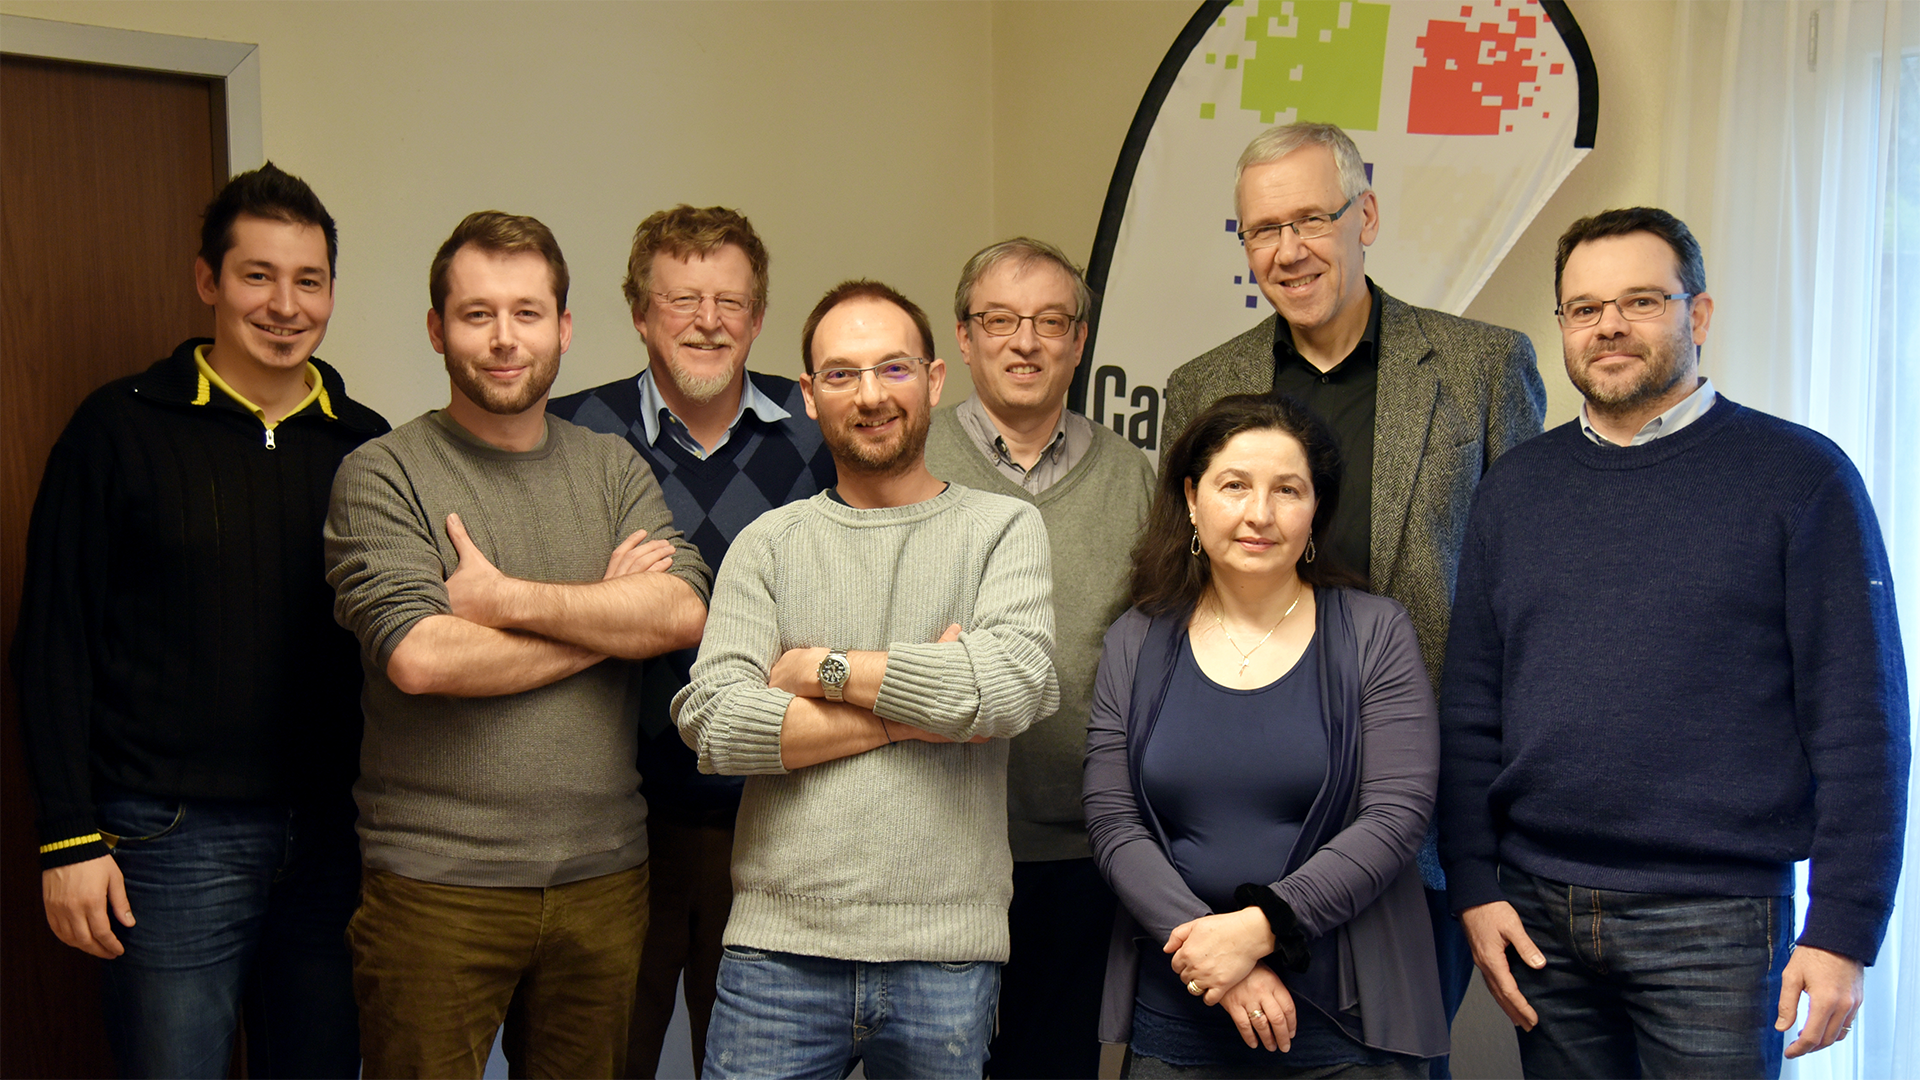 L'équipe de cath.ch